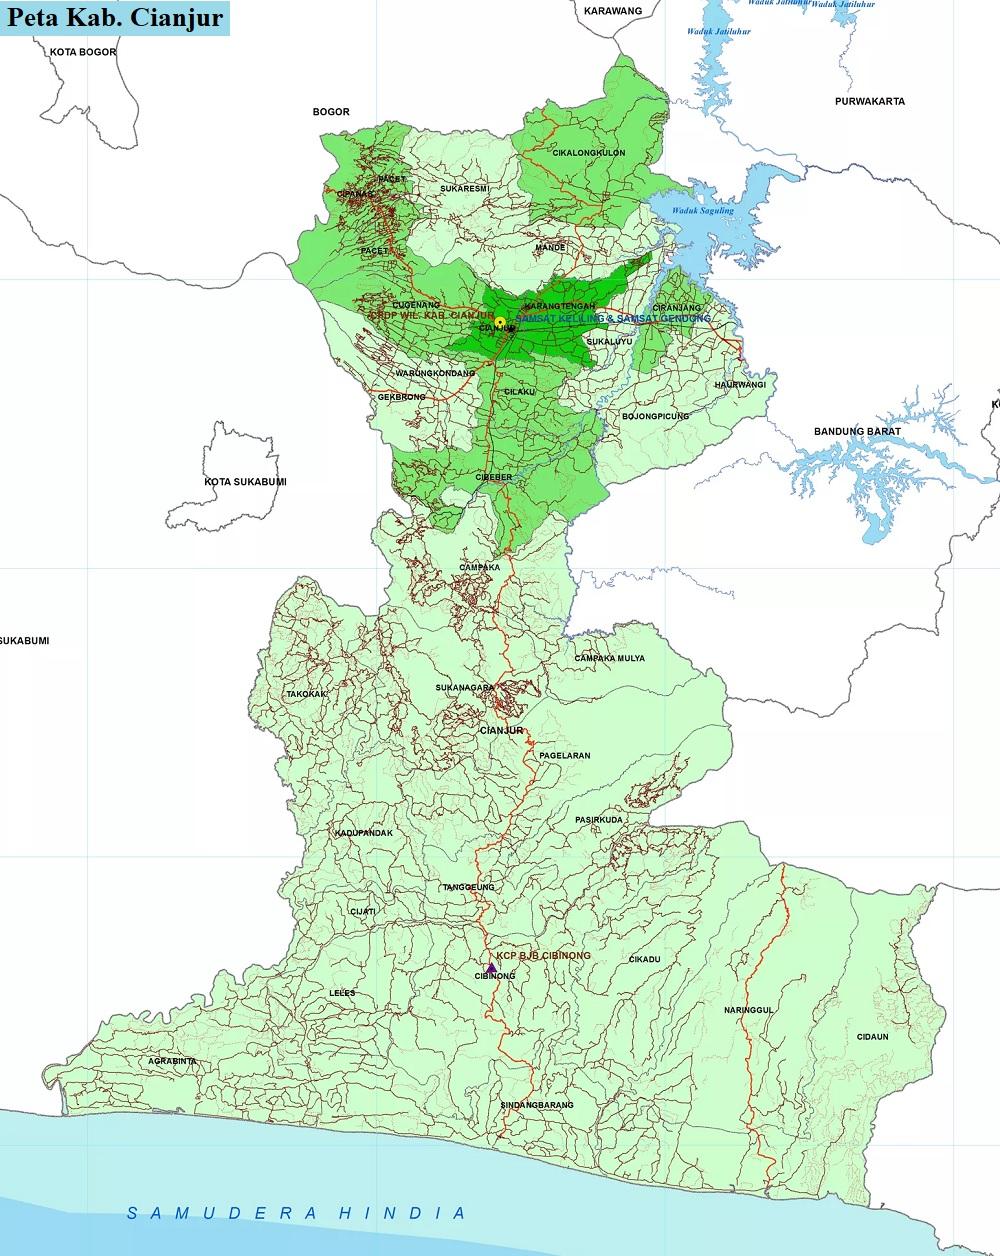 Peta Kabupaten Cianjur